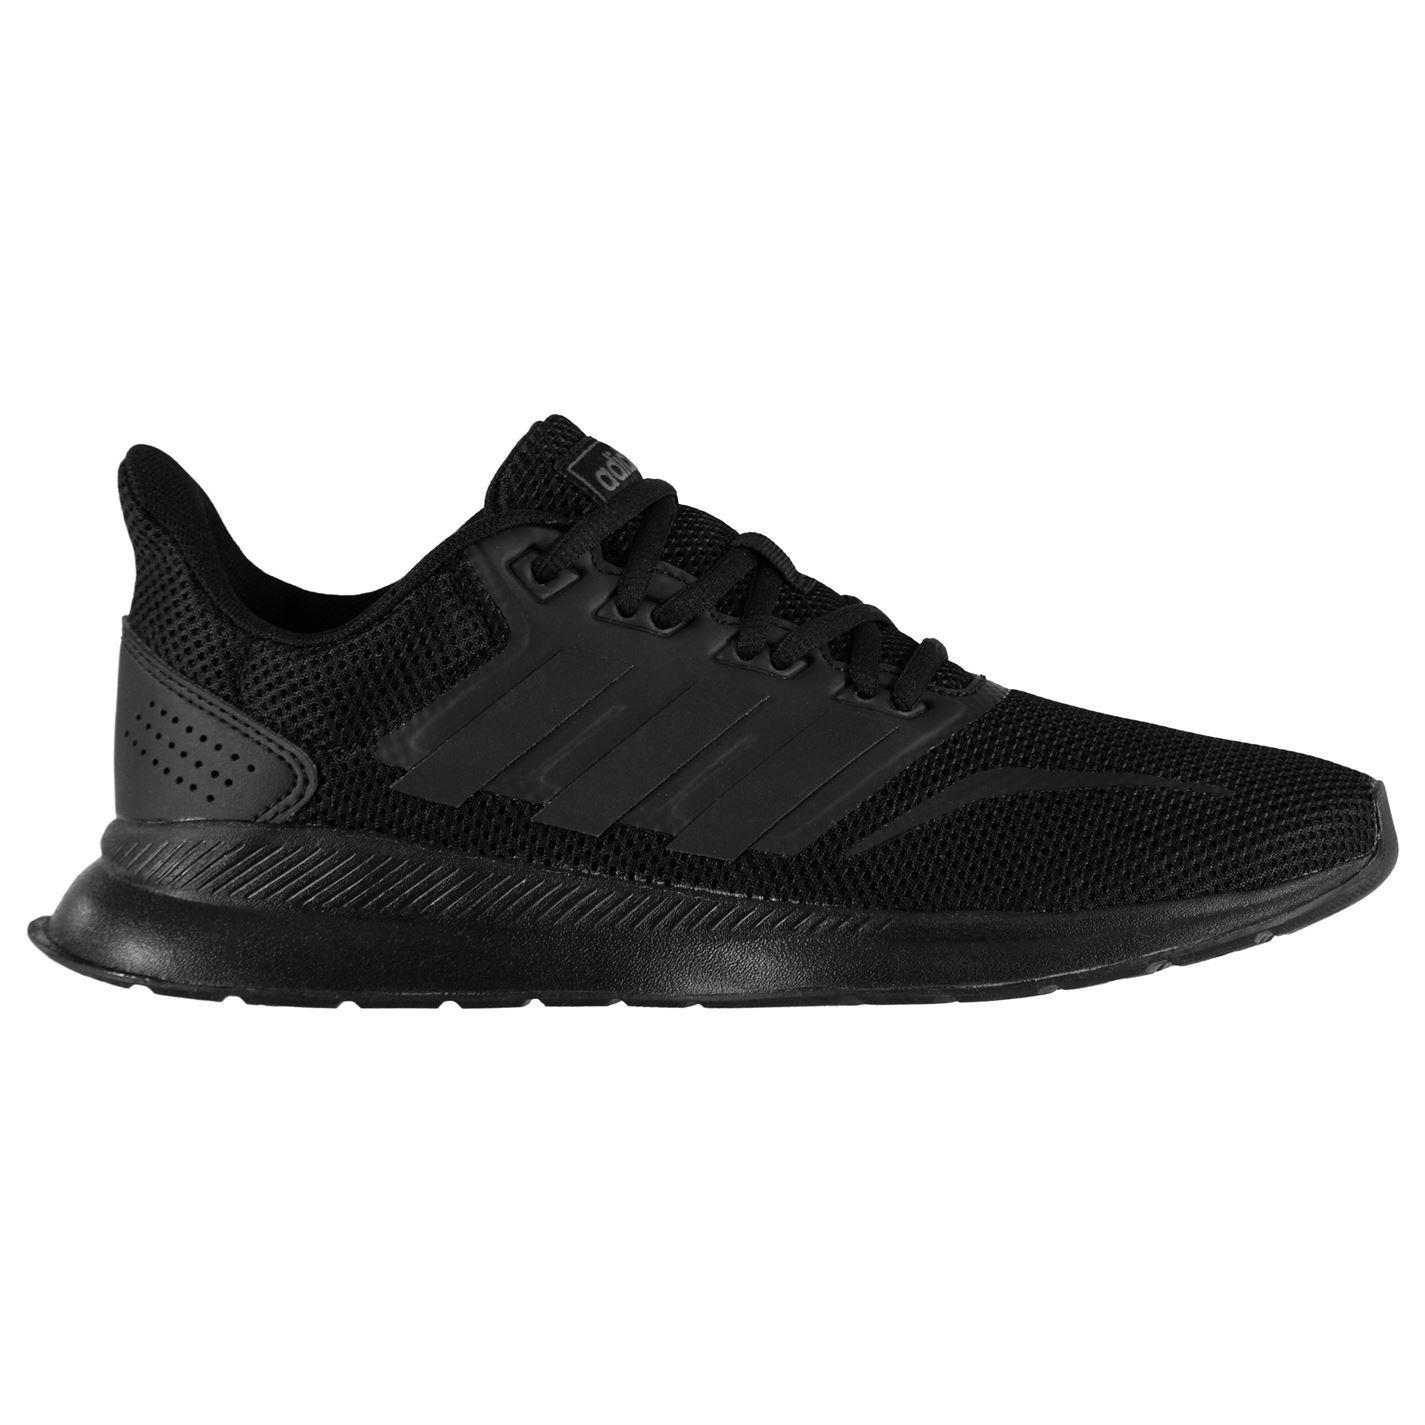 adidas-Falcon-Trainers-Junior-Boys-Shoes-Footwear thumbnail 3